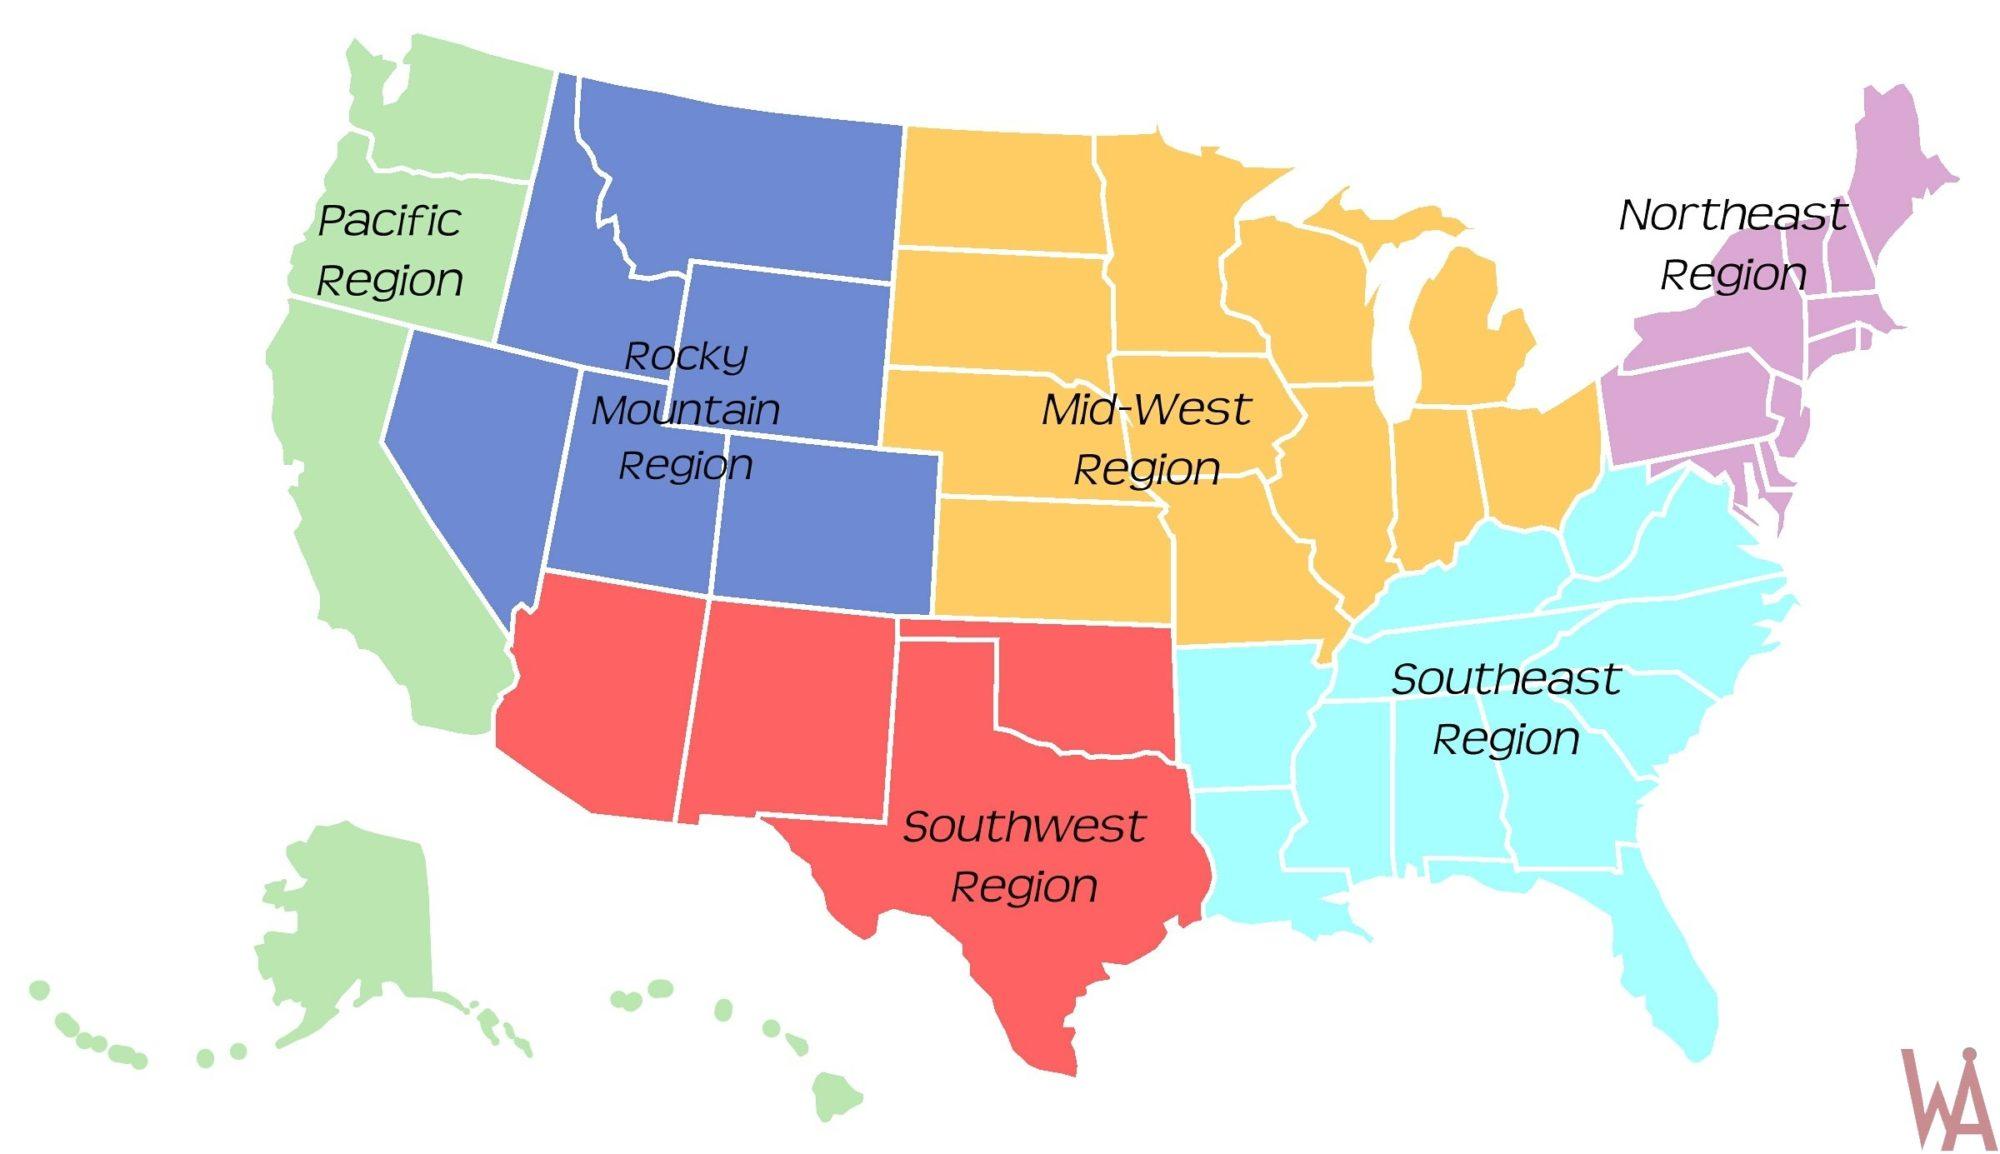 interactive region map of USA